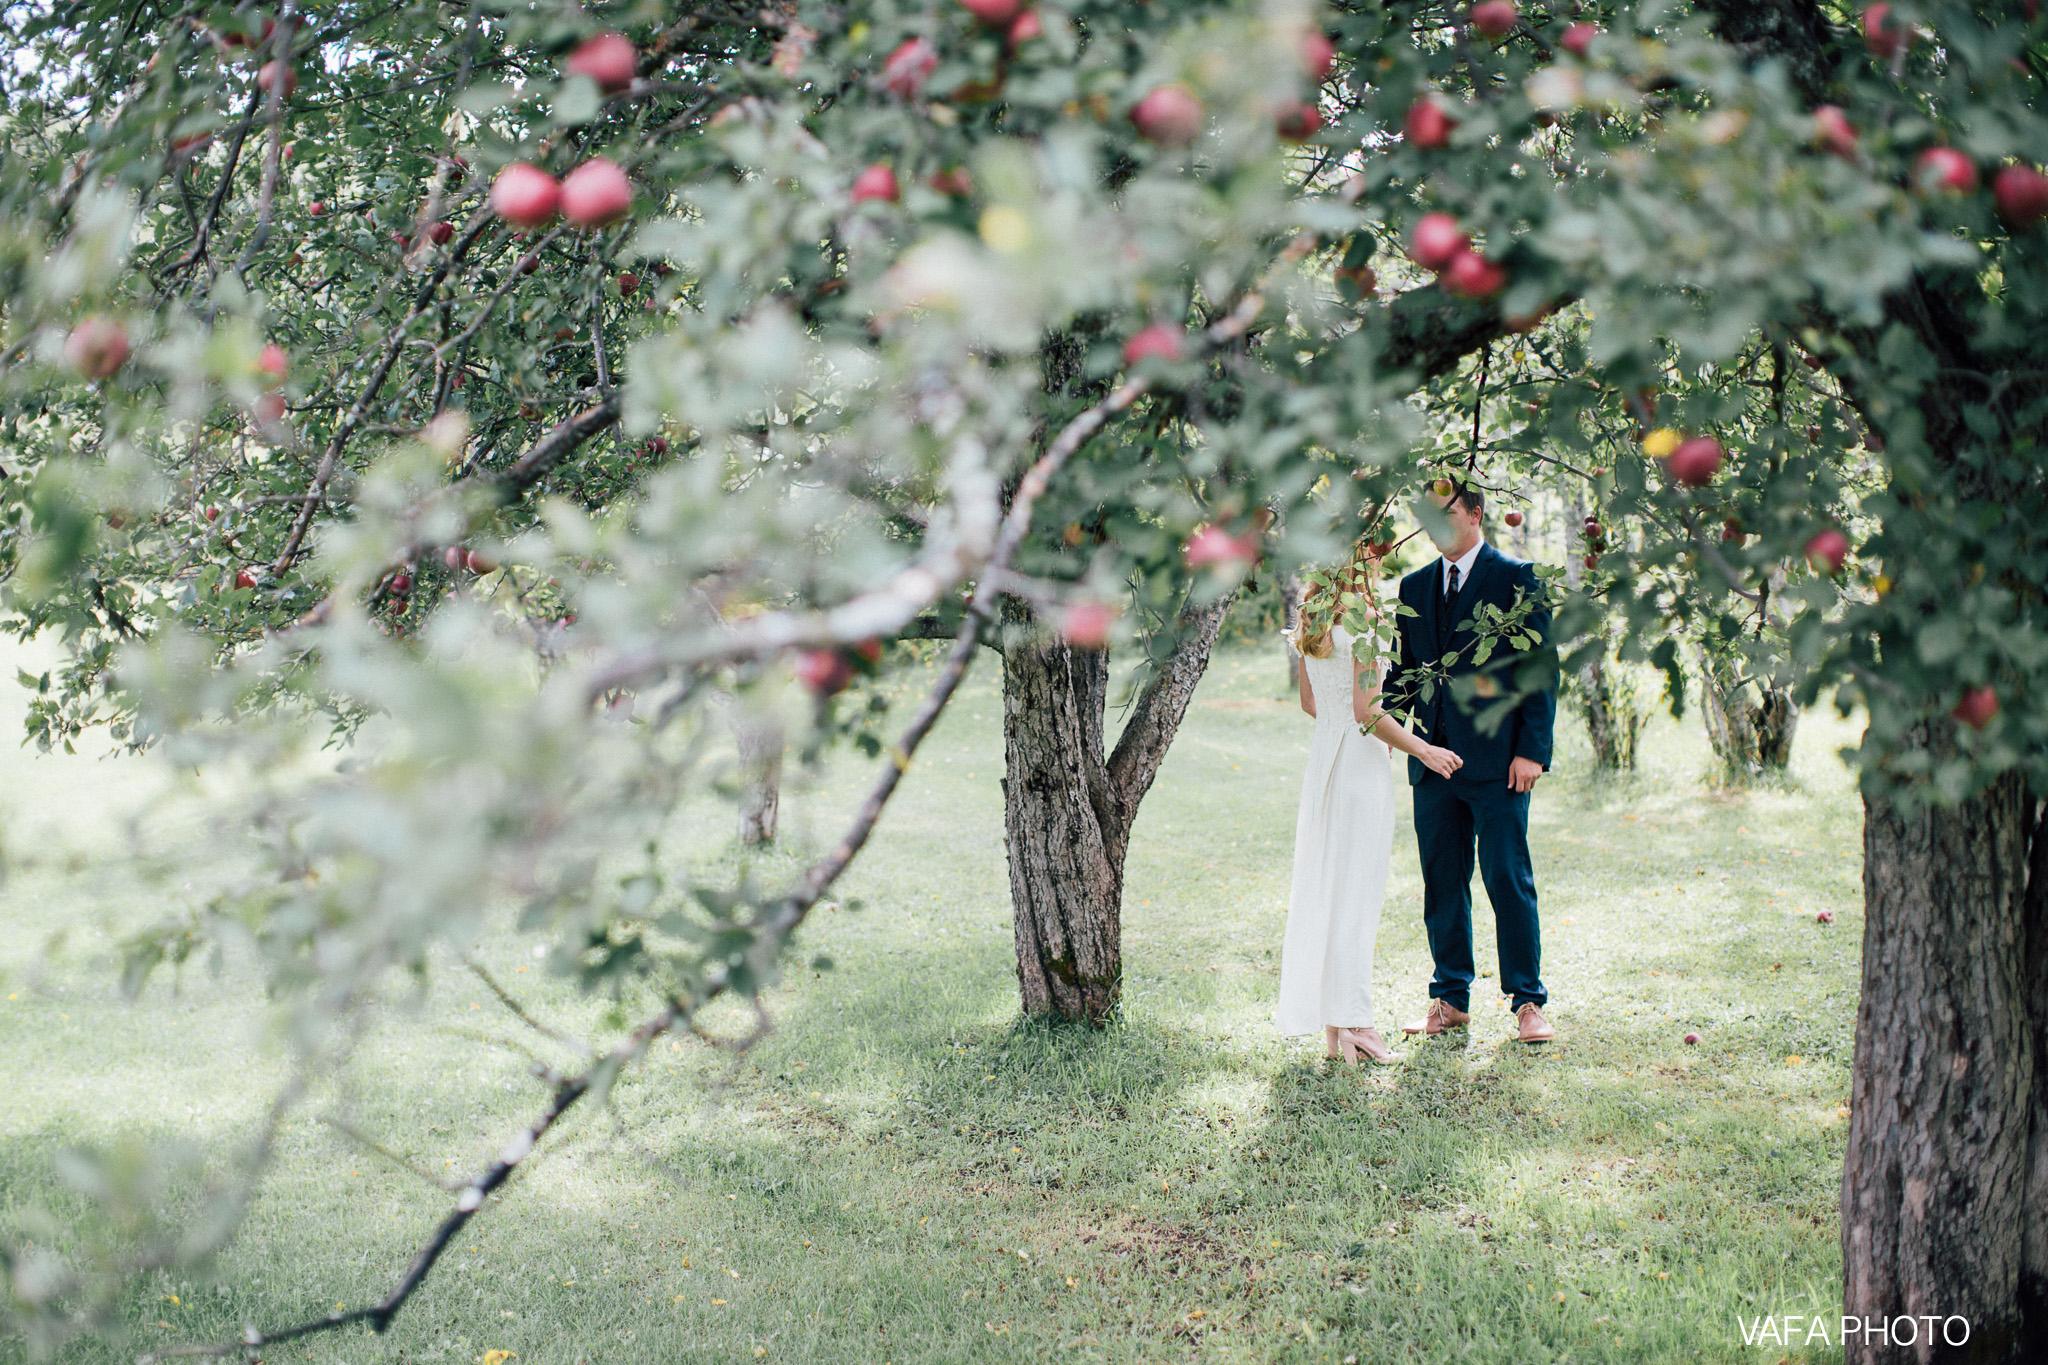 Belsolda-Farm-Wedding-Christy-Eric-Vafa-Photo-56.jpg